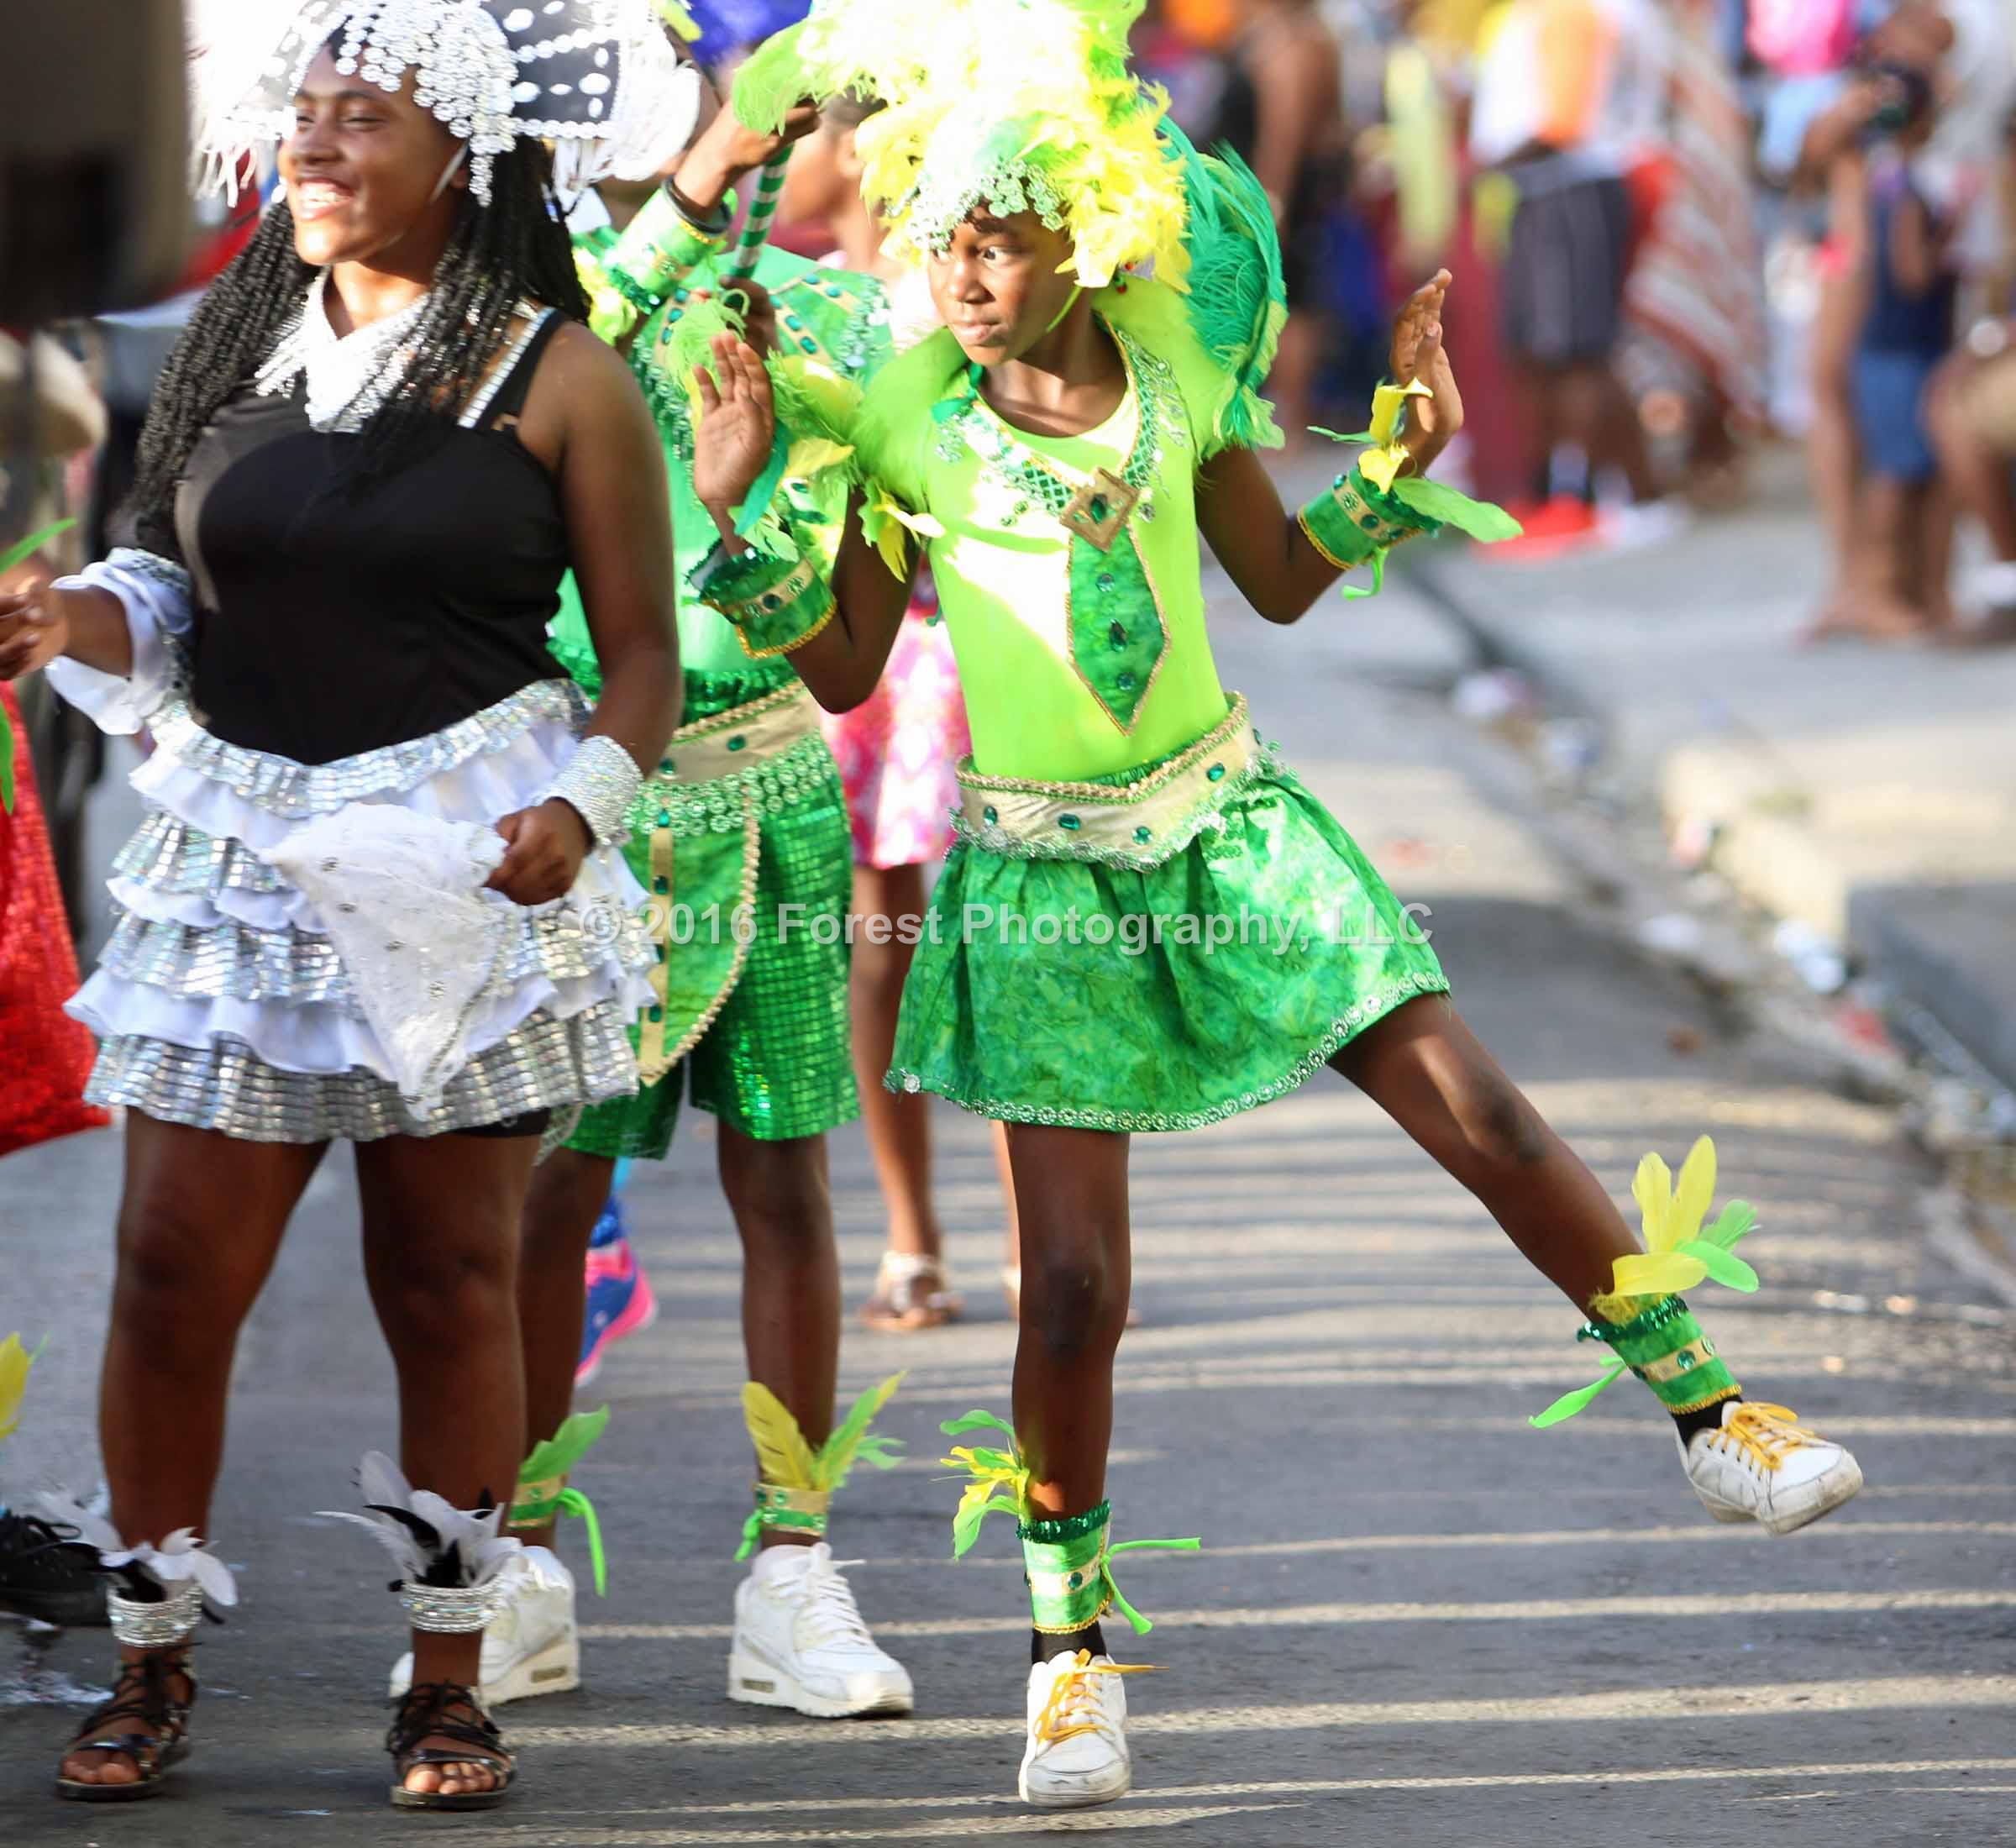 carnival_last_lap683